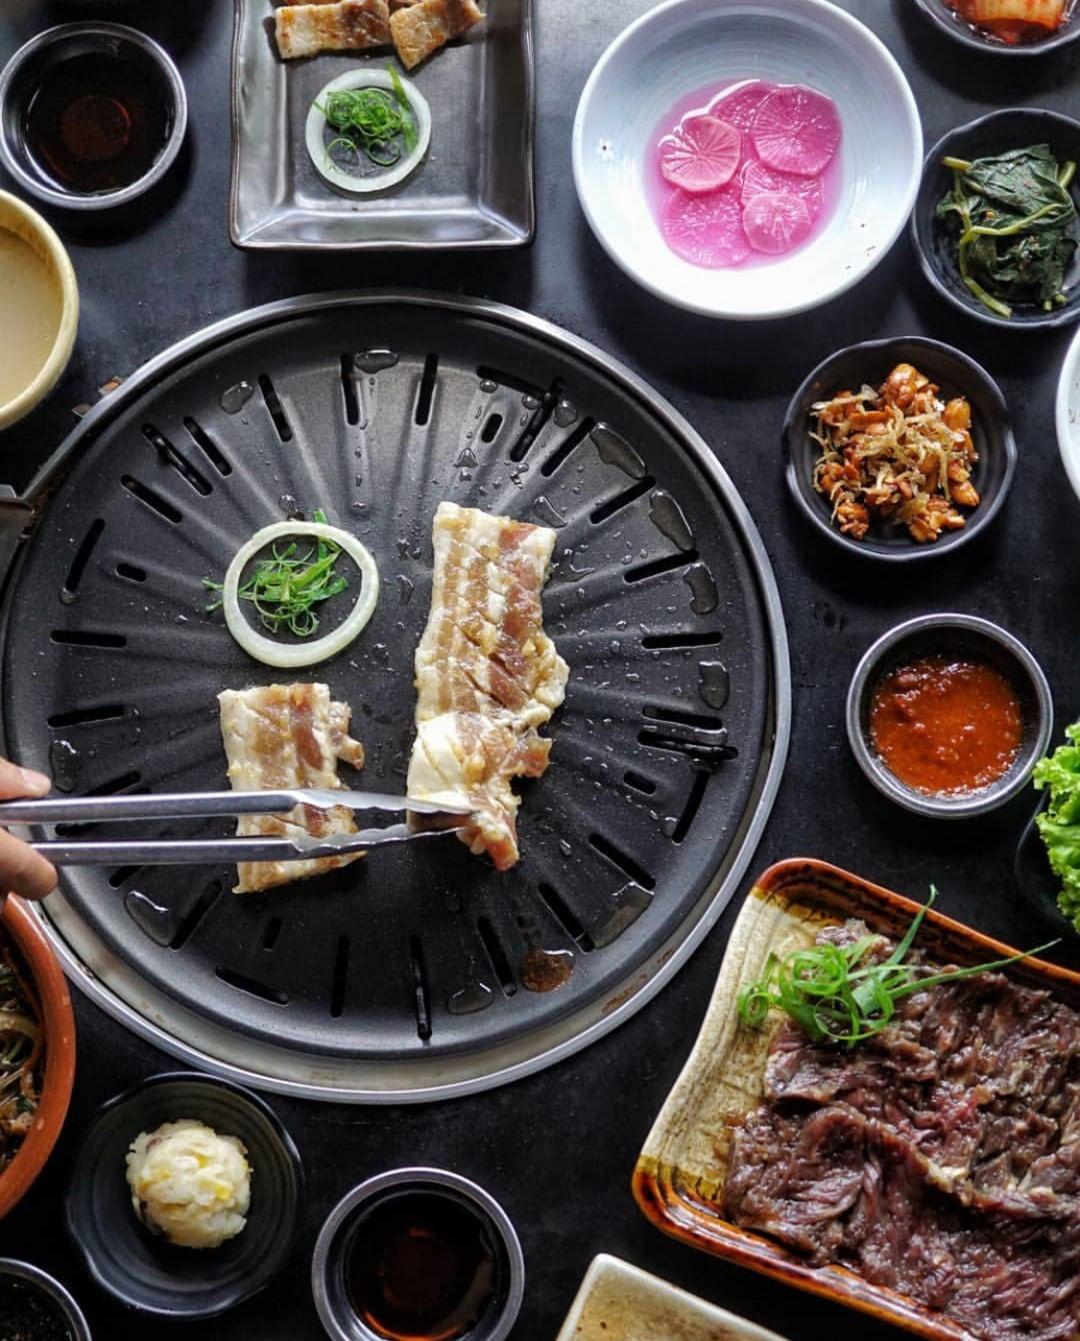 weekly new restaurants metro manila korean restaurants mexican restaurants bgc restaurants in bgc fort bonifacio